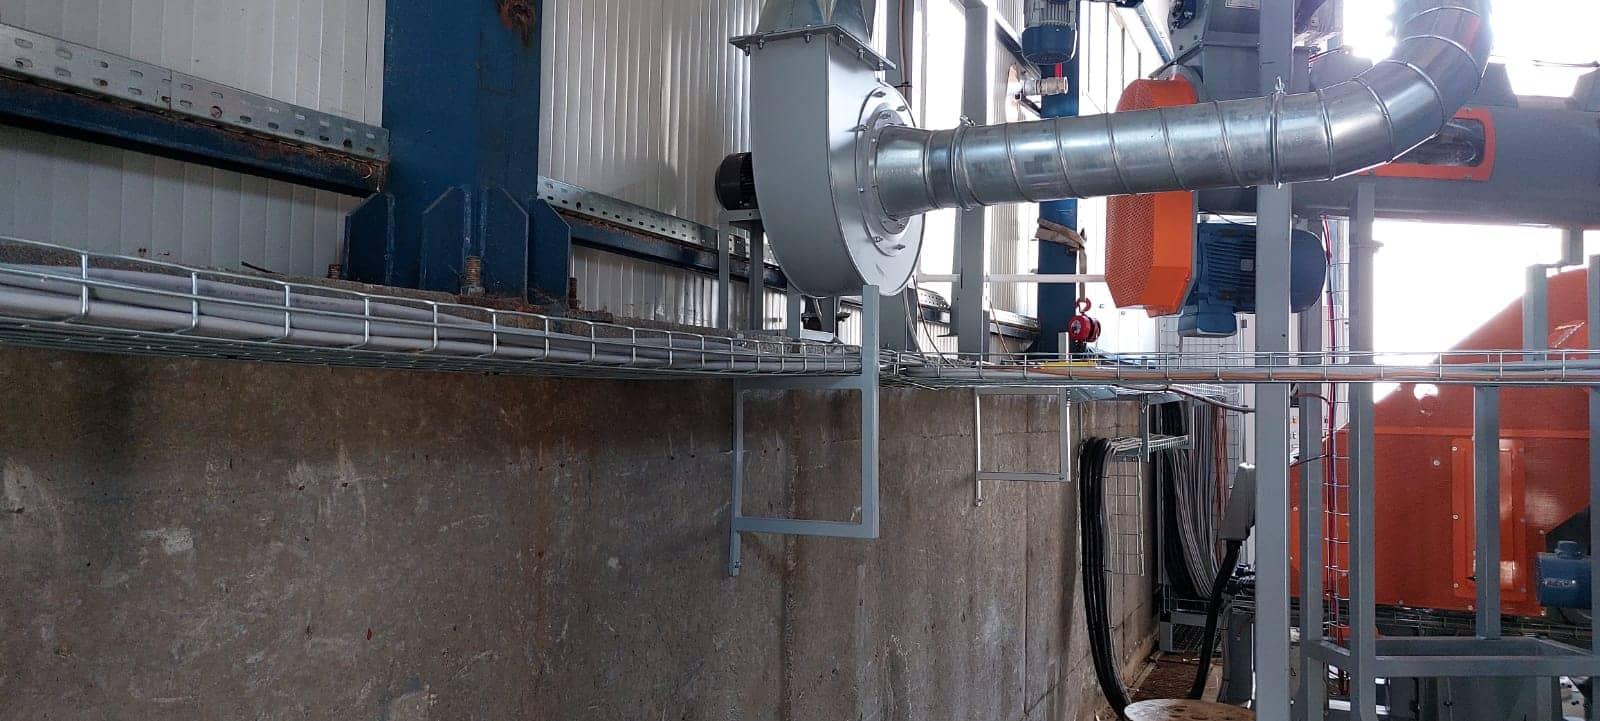 Linie peleti capacitate 2 tone pe ora judetul Neamt 8